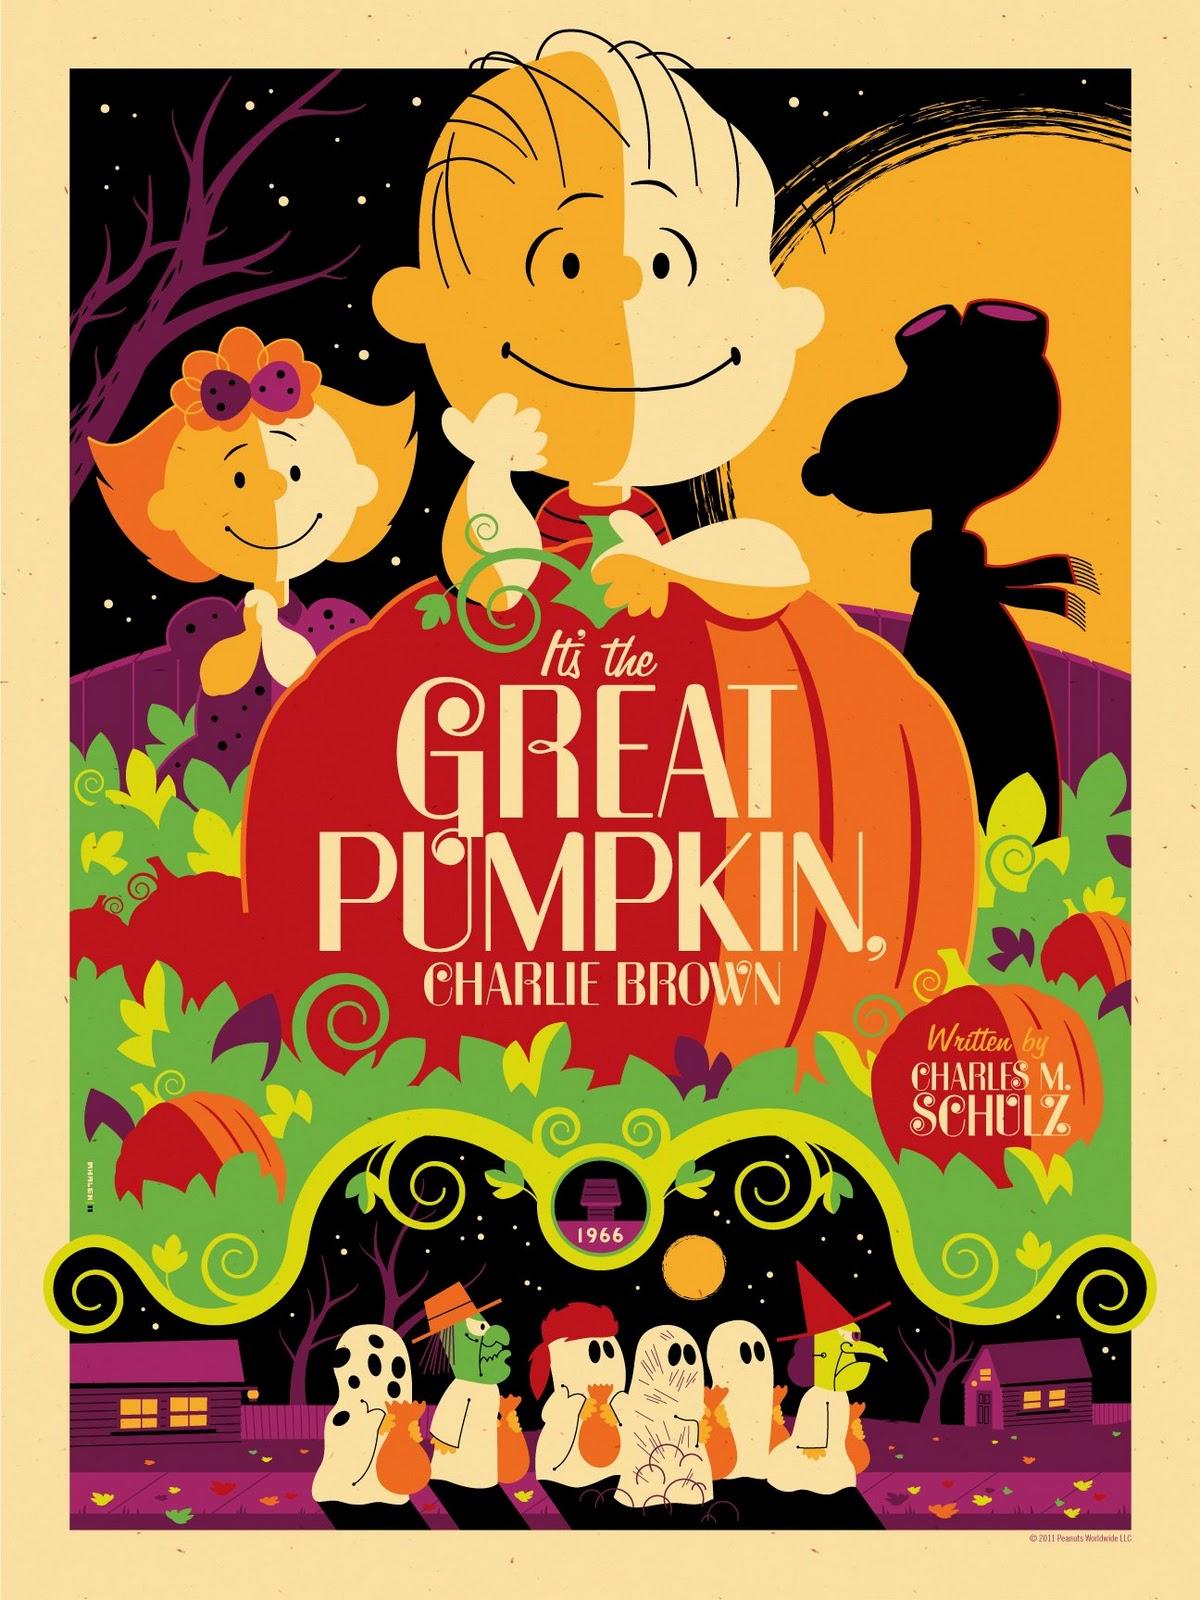 https://www.goodreads.com/book/show/1915739.It_s_the_Great_Pumpkin_Charlie_Brown